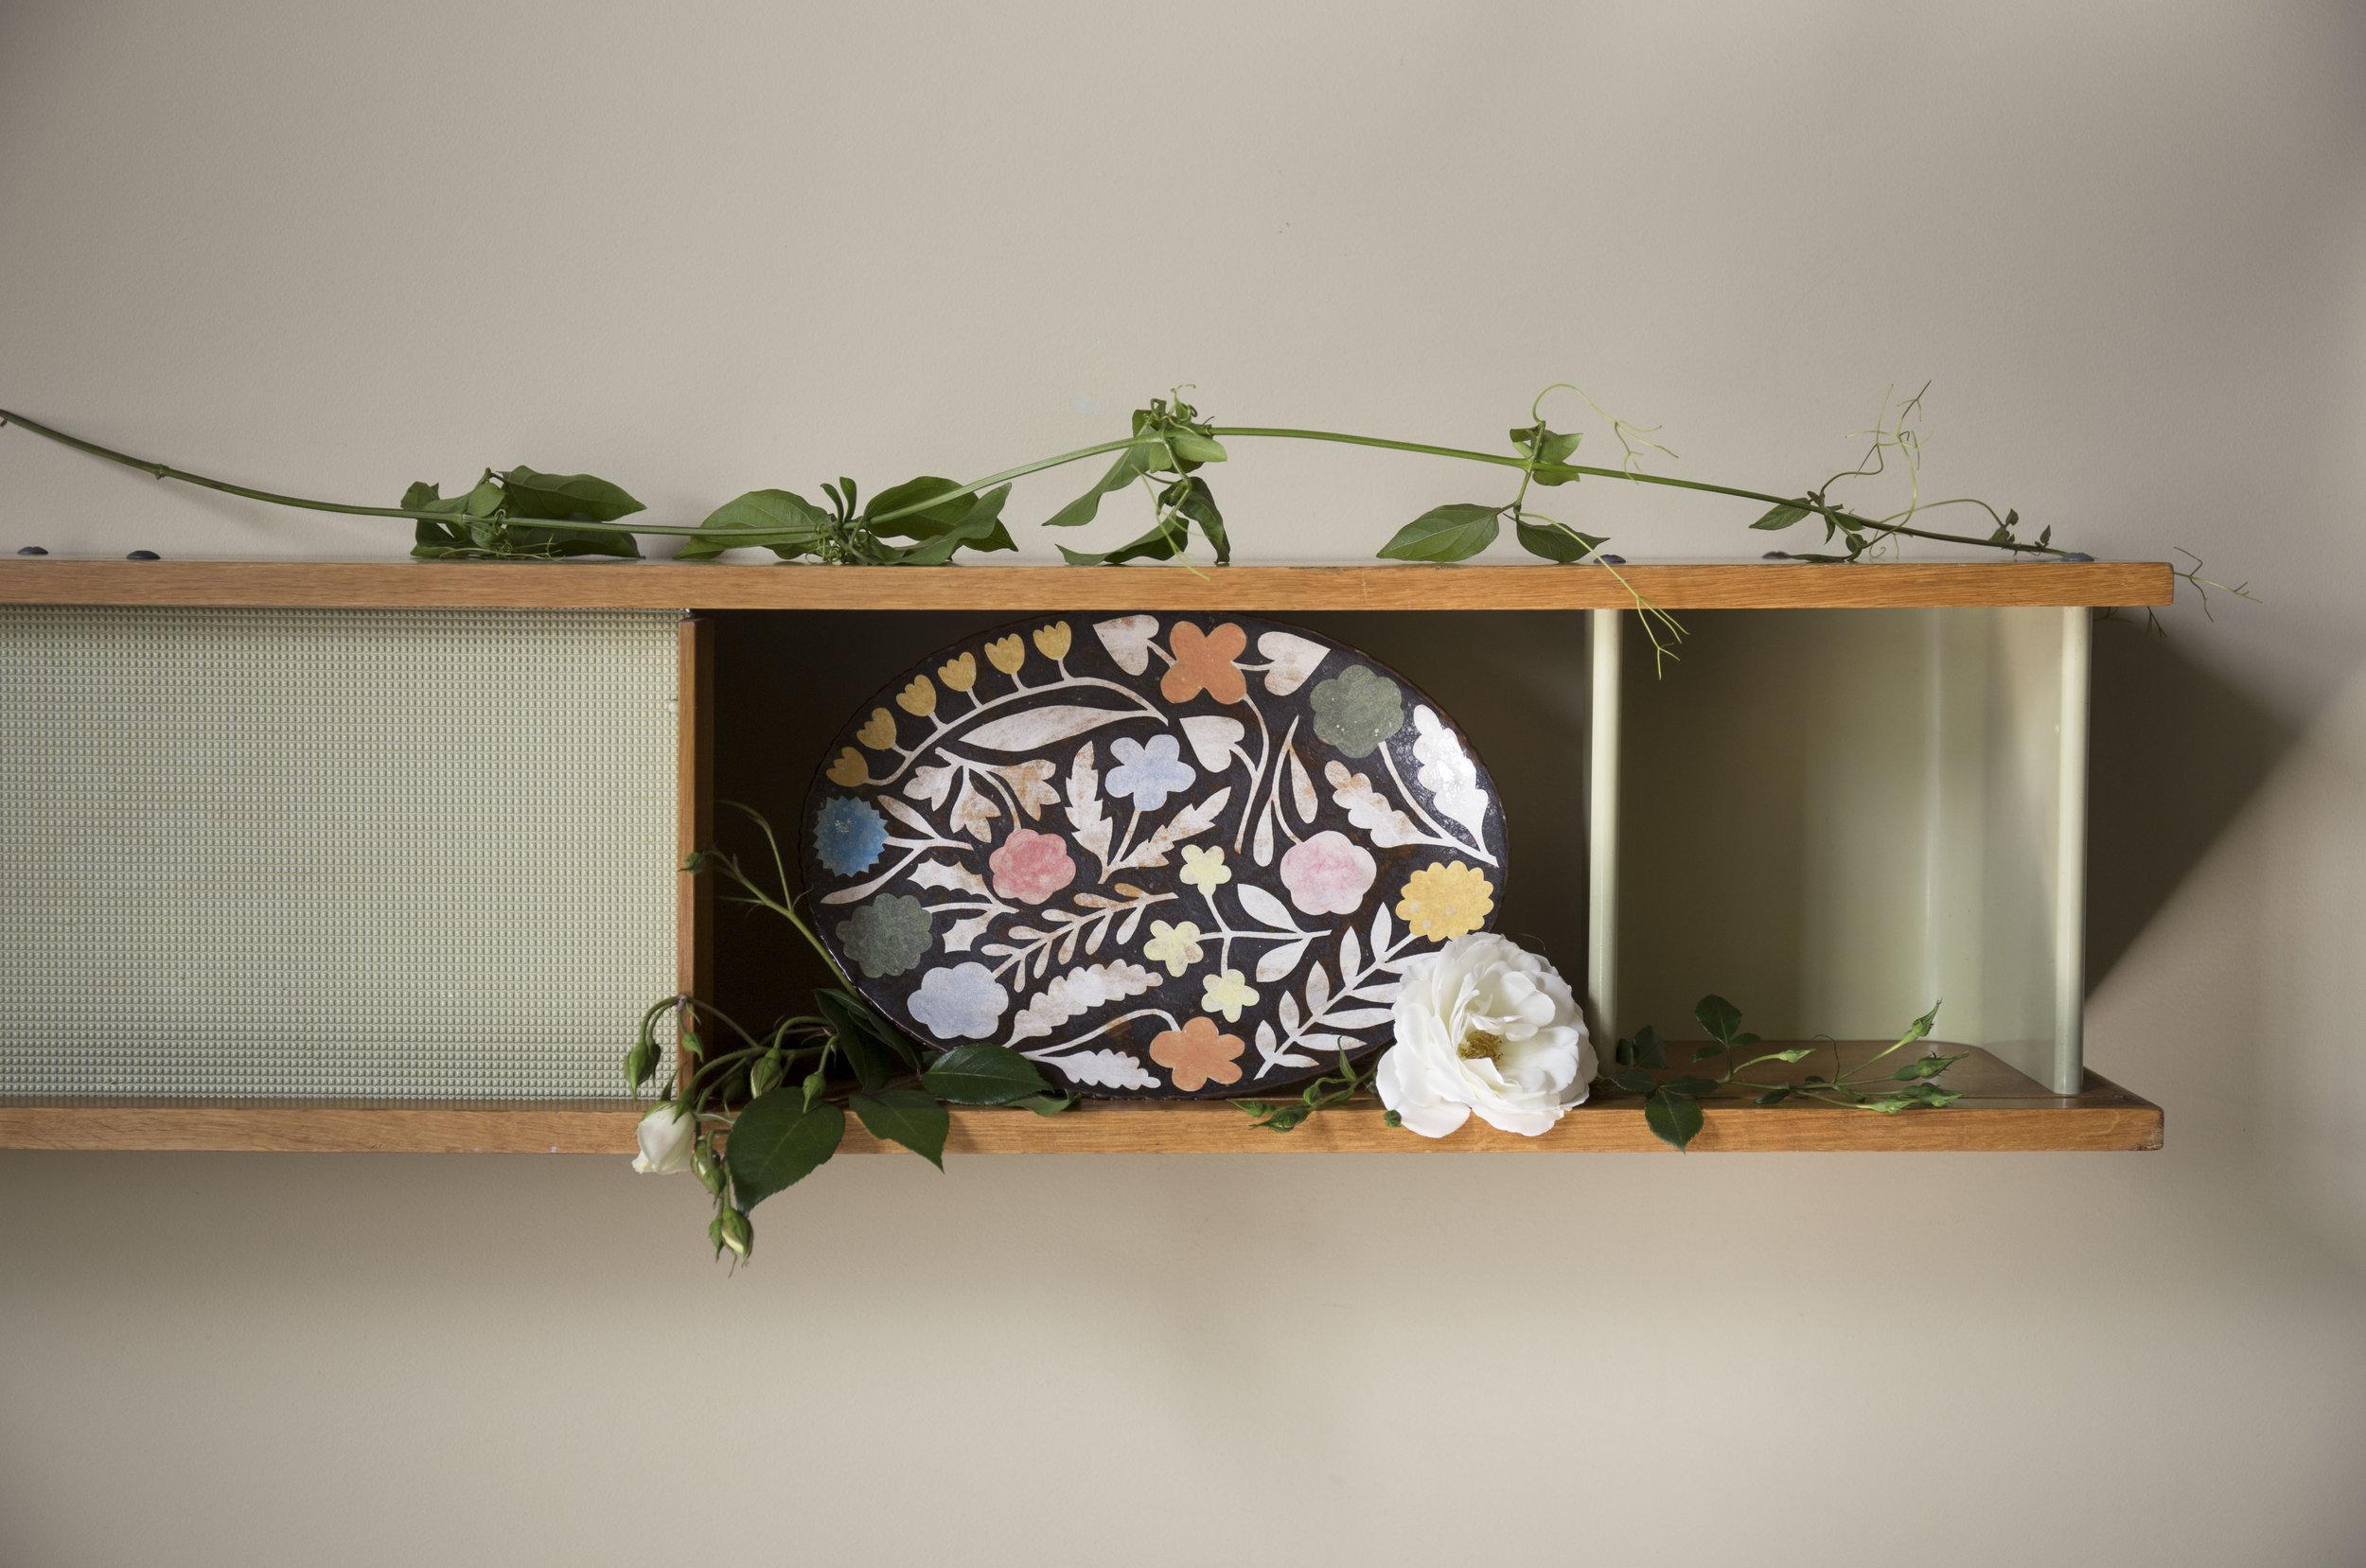 """Vibrant Summer Blossoms"" by Makoto Kagoshima on Charlotte Perriand wall mount."